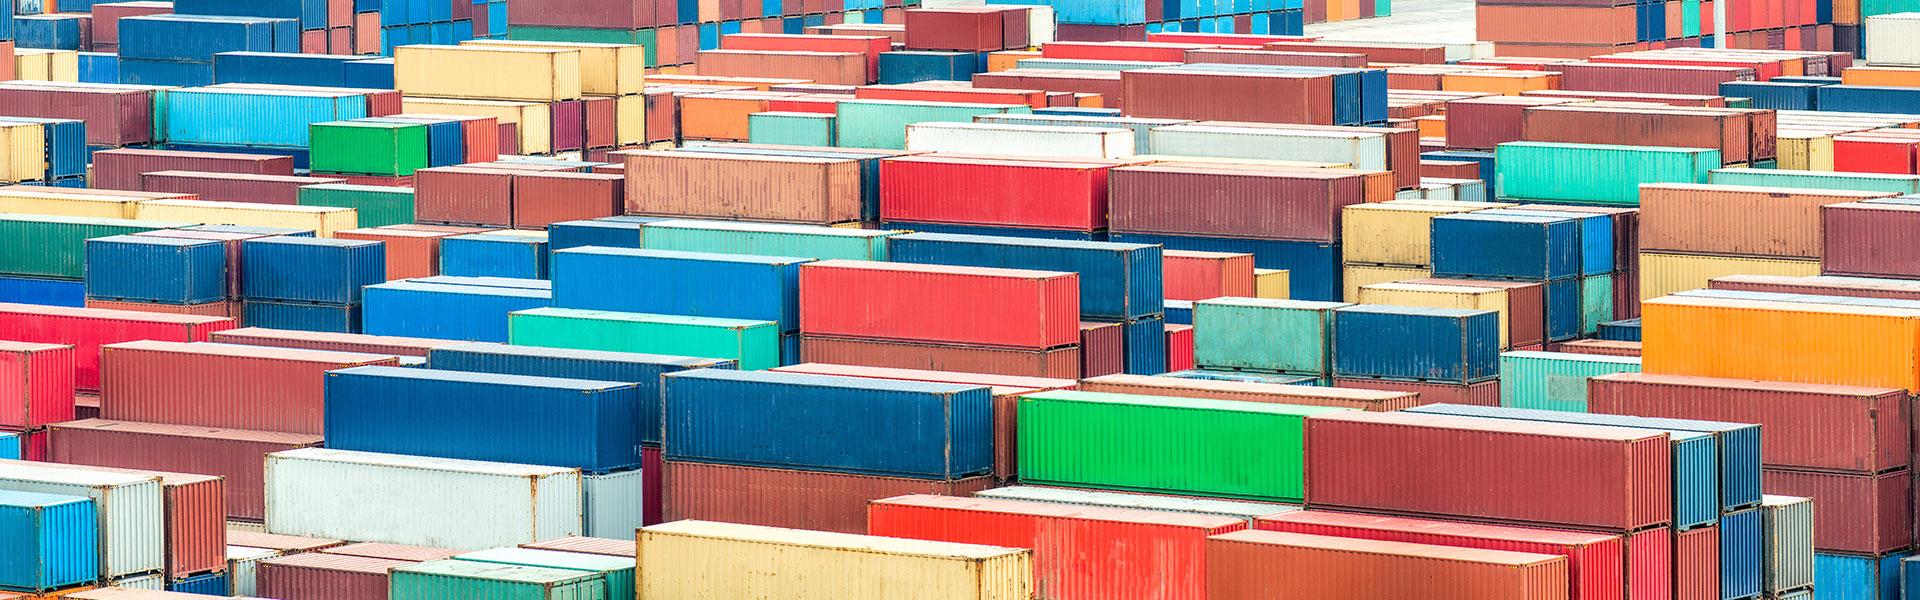 Viele bunte Container